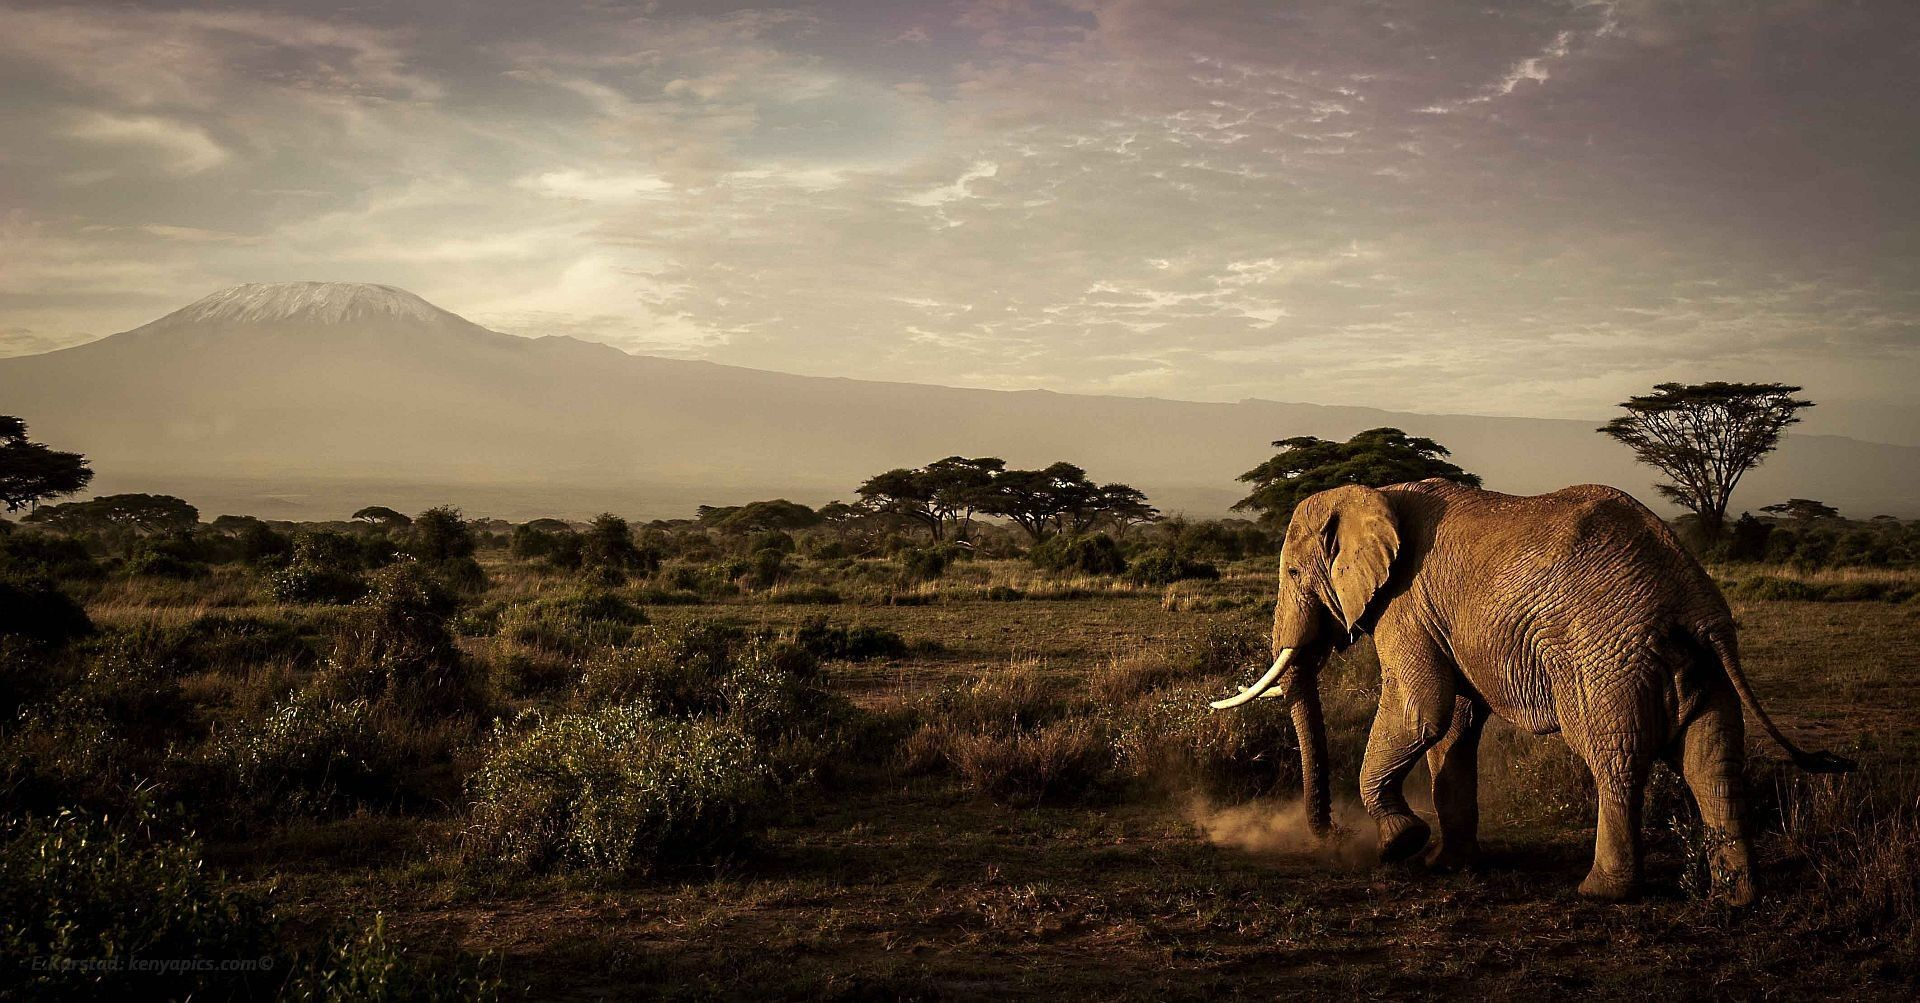 Elephants in Kenya. Amazing! | Coffee Lands | Pinterest | Kenya ...